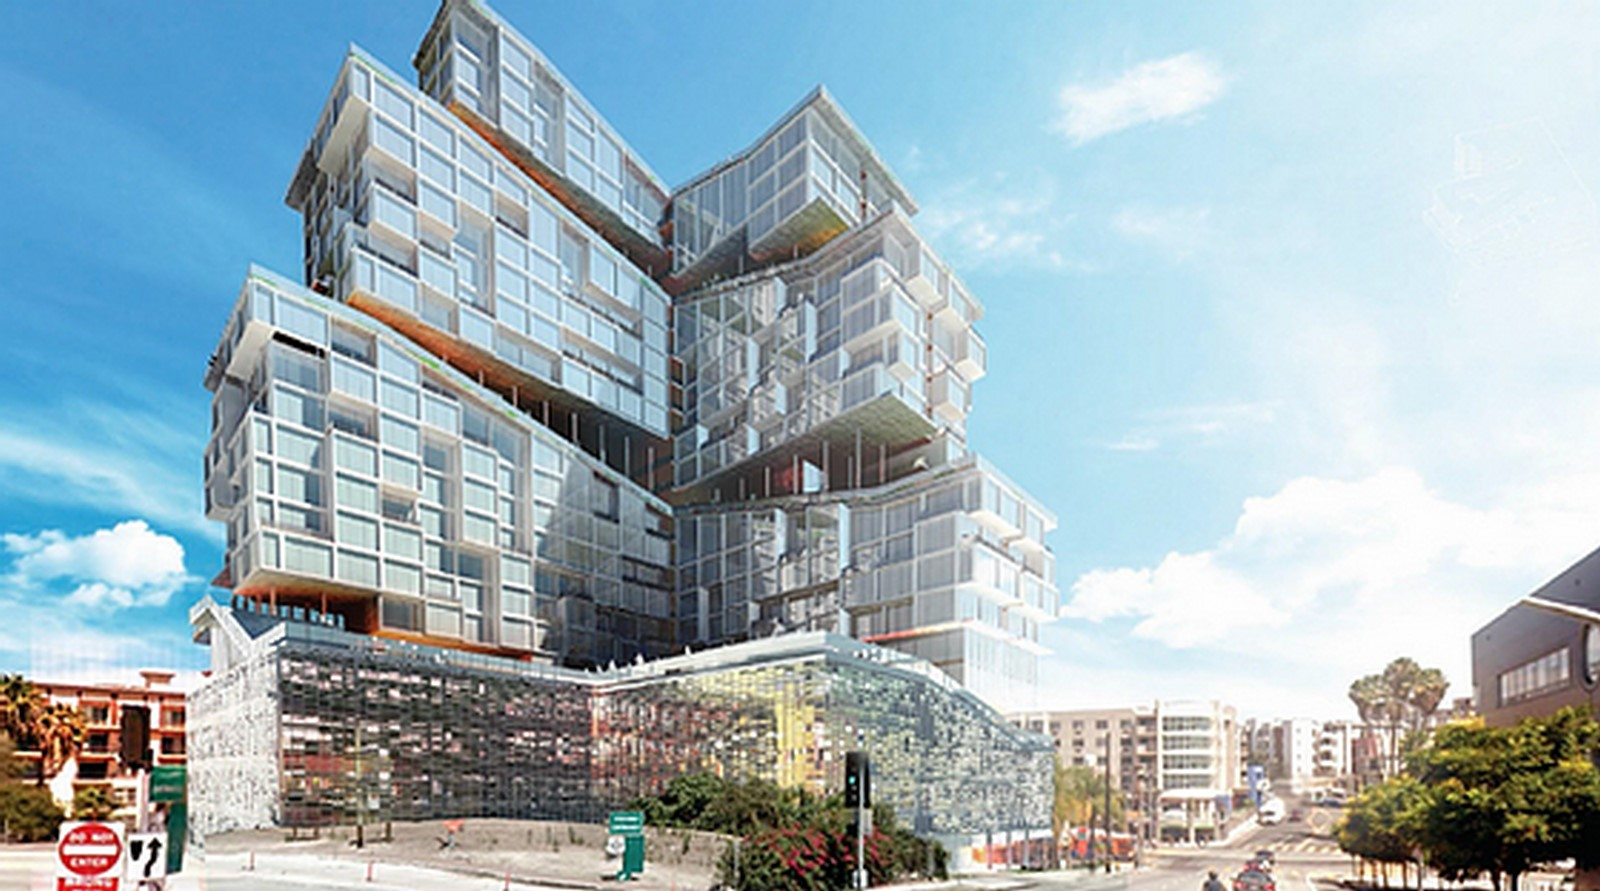 Architects in Irvine - Top 80 Architects in Irvine - Sheet1